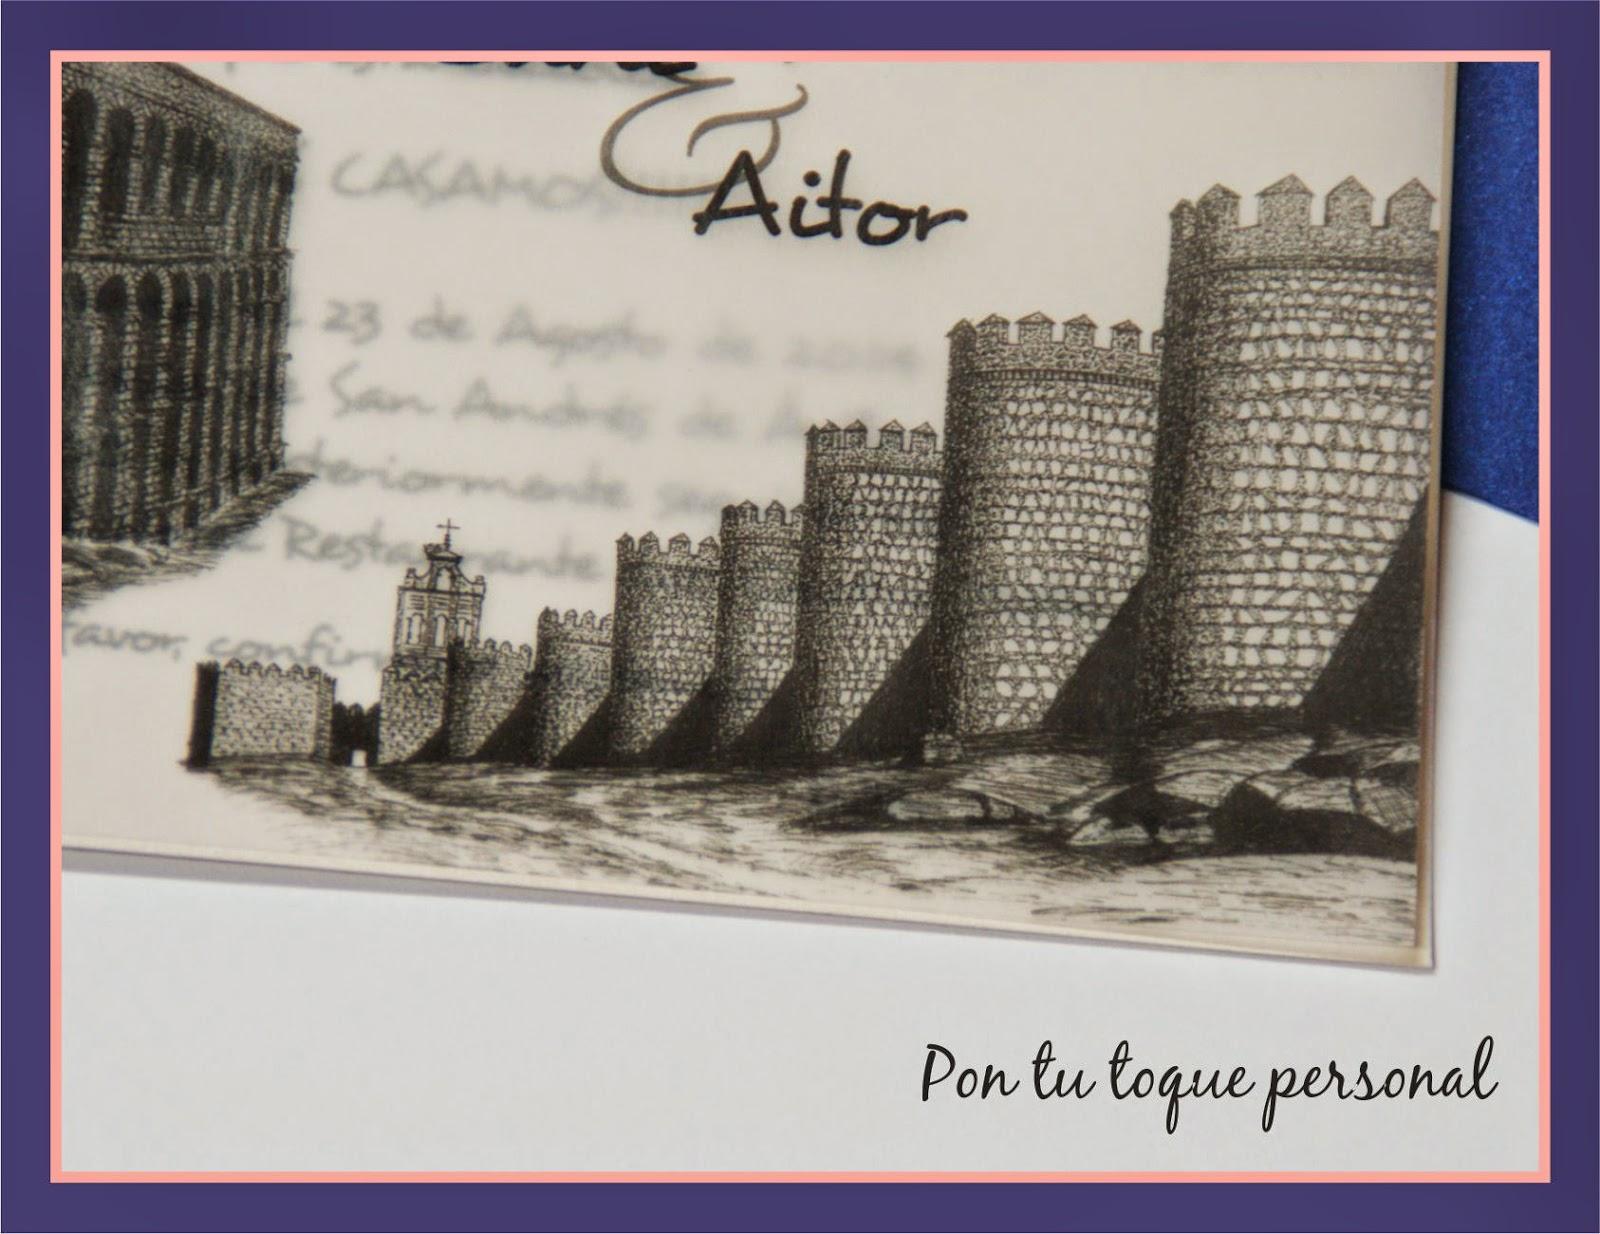 invitacion de boda elegante con dibujos a plumilla Segovia y Avila 2